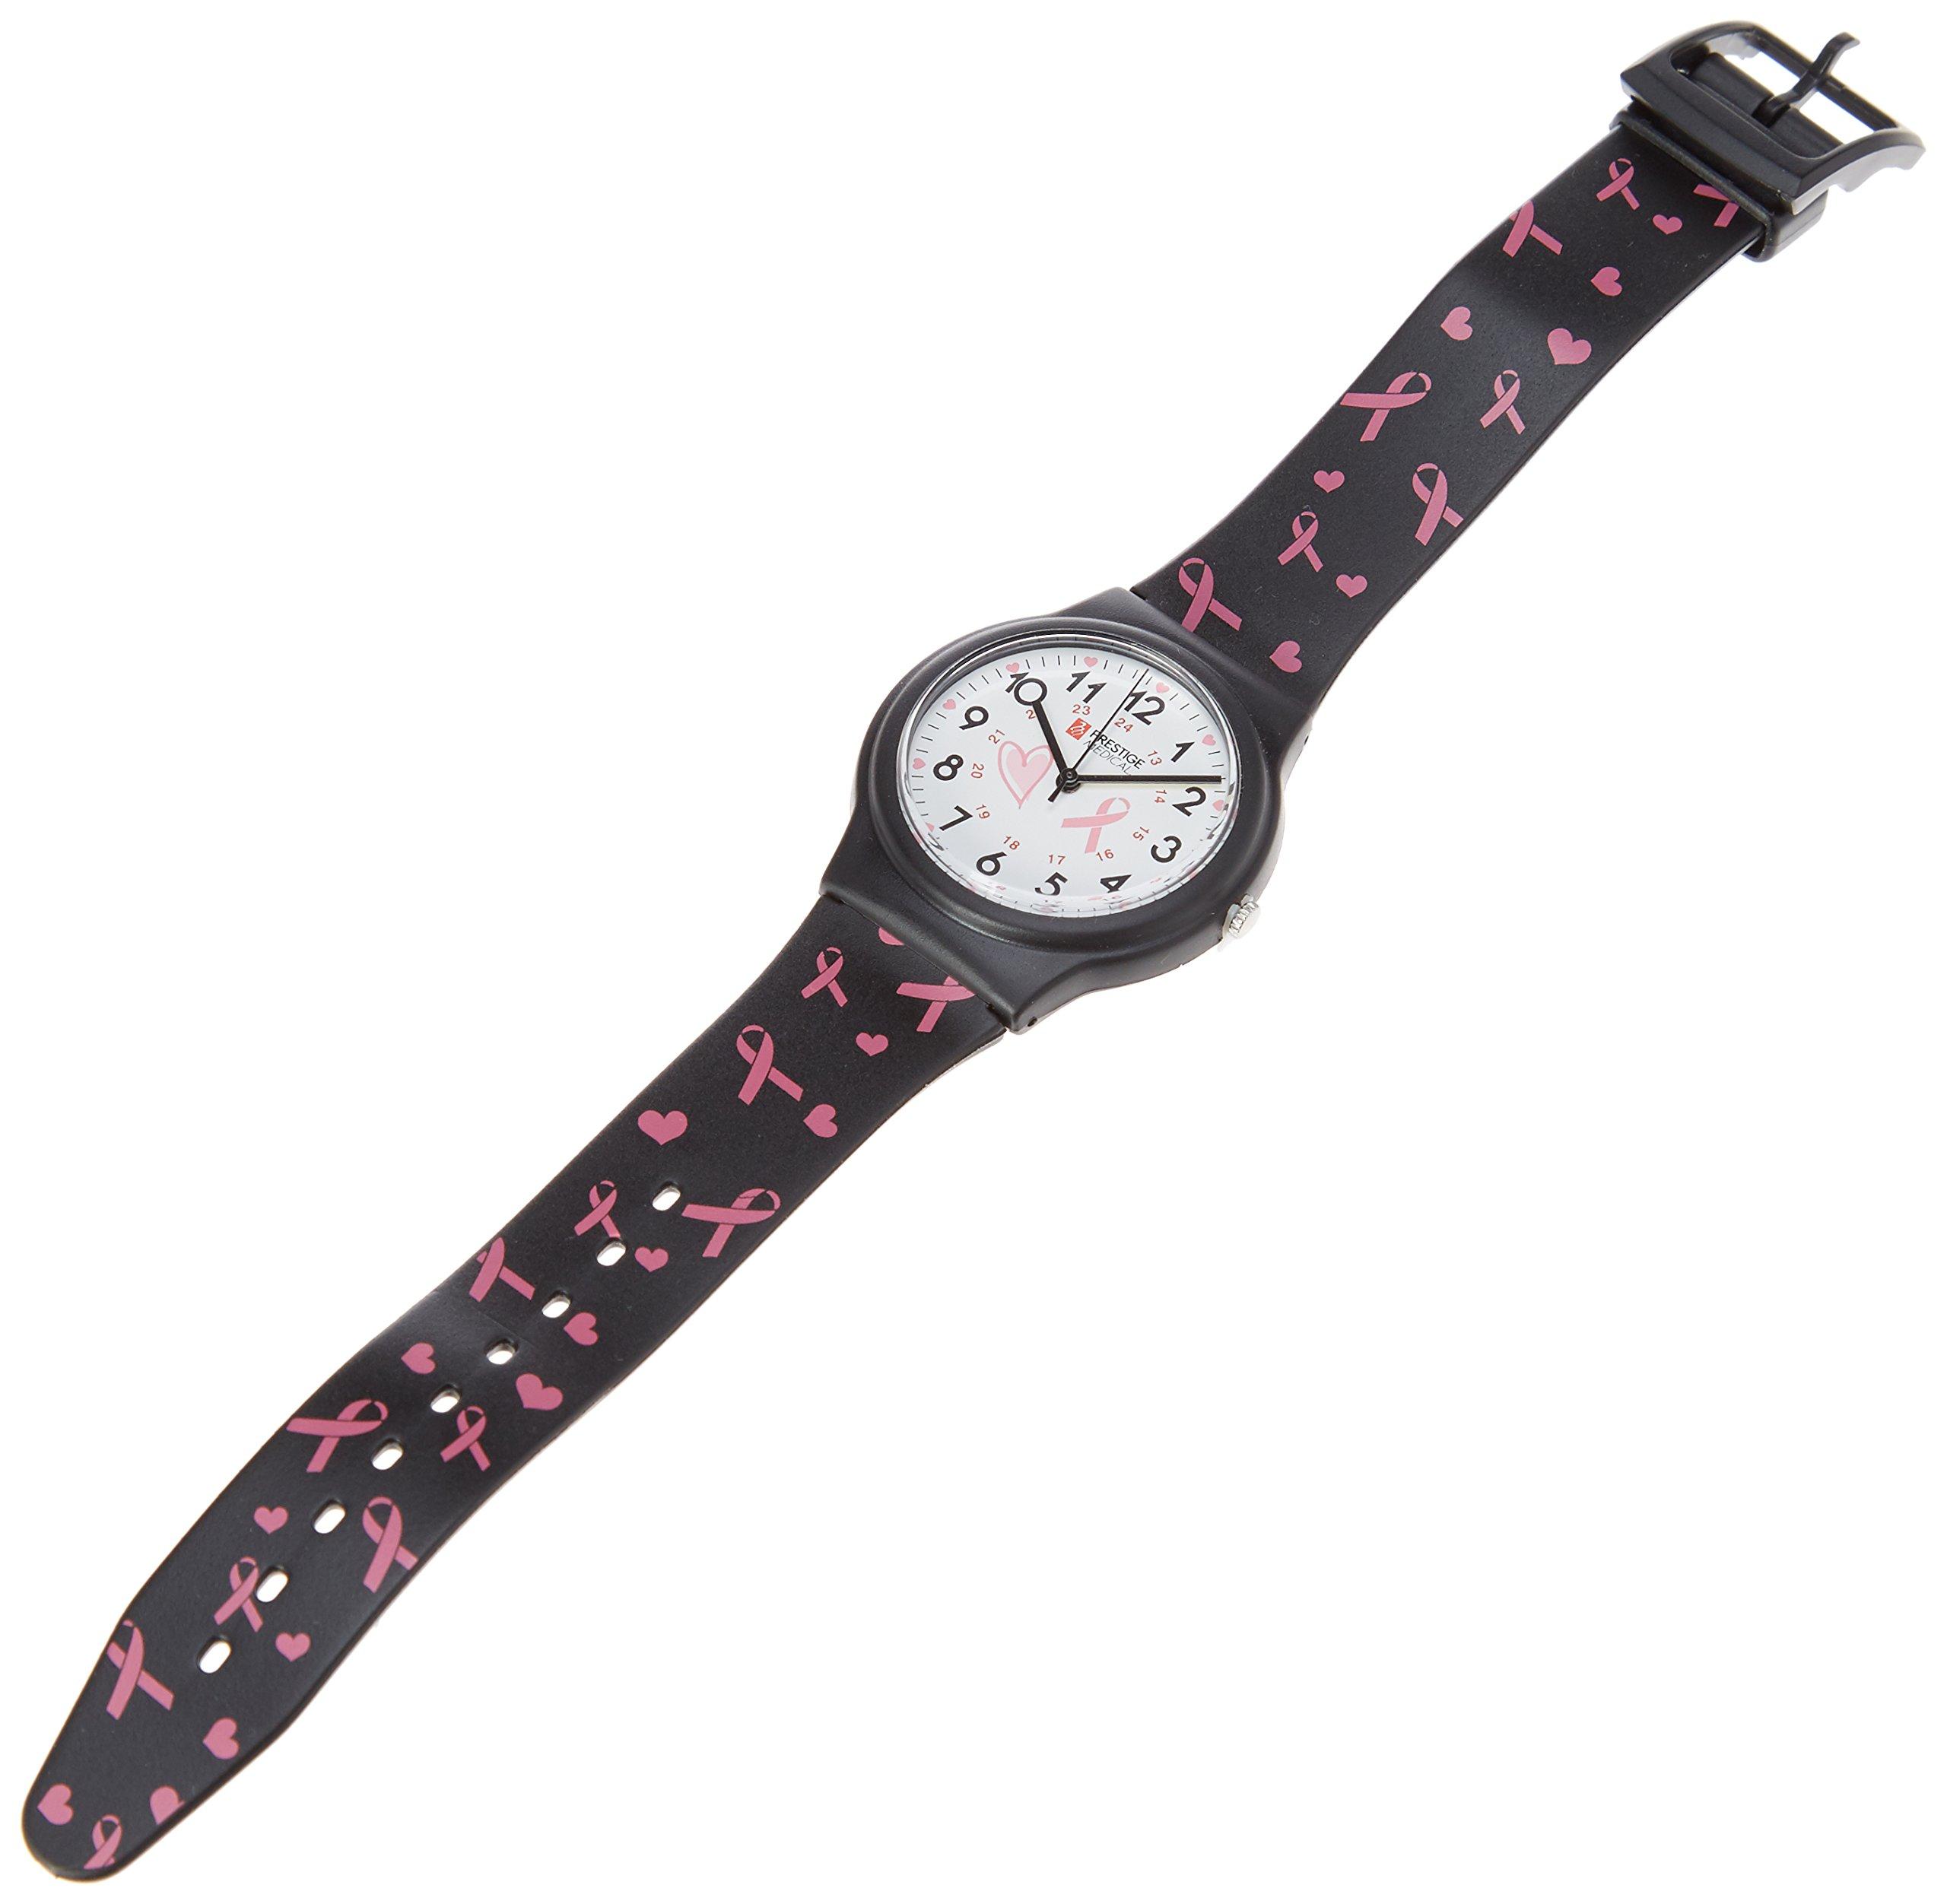 Prestige Medical Basic Scrub Watch, Pink Ribbons Black